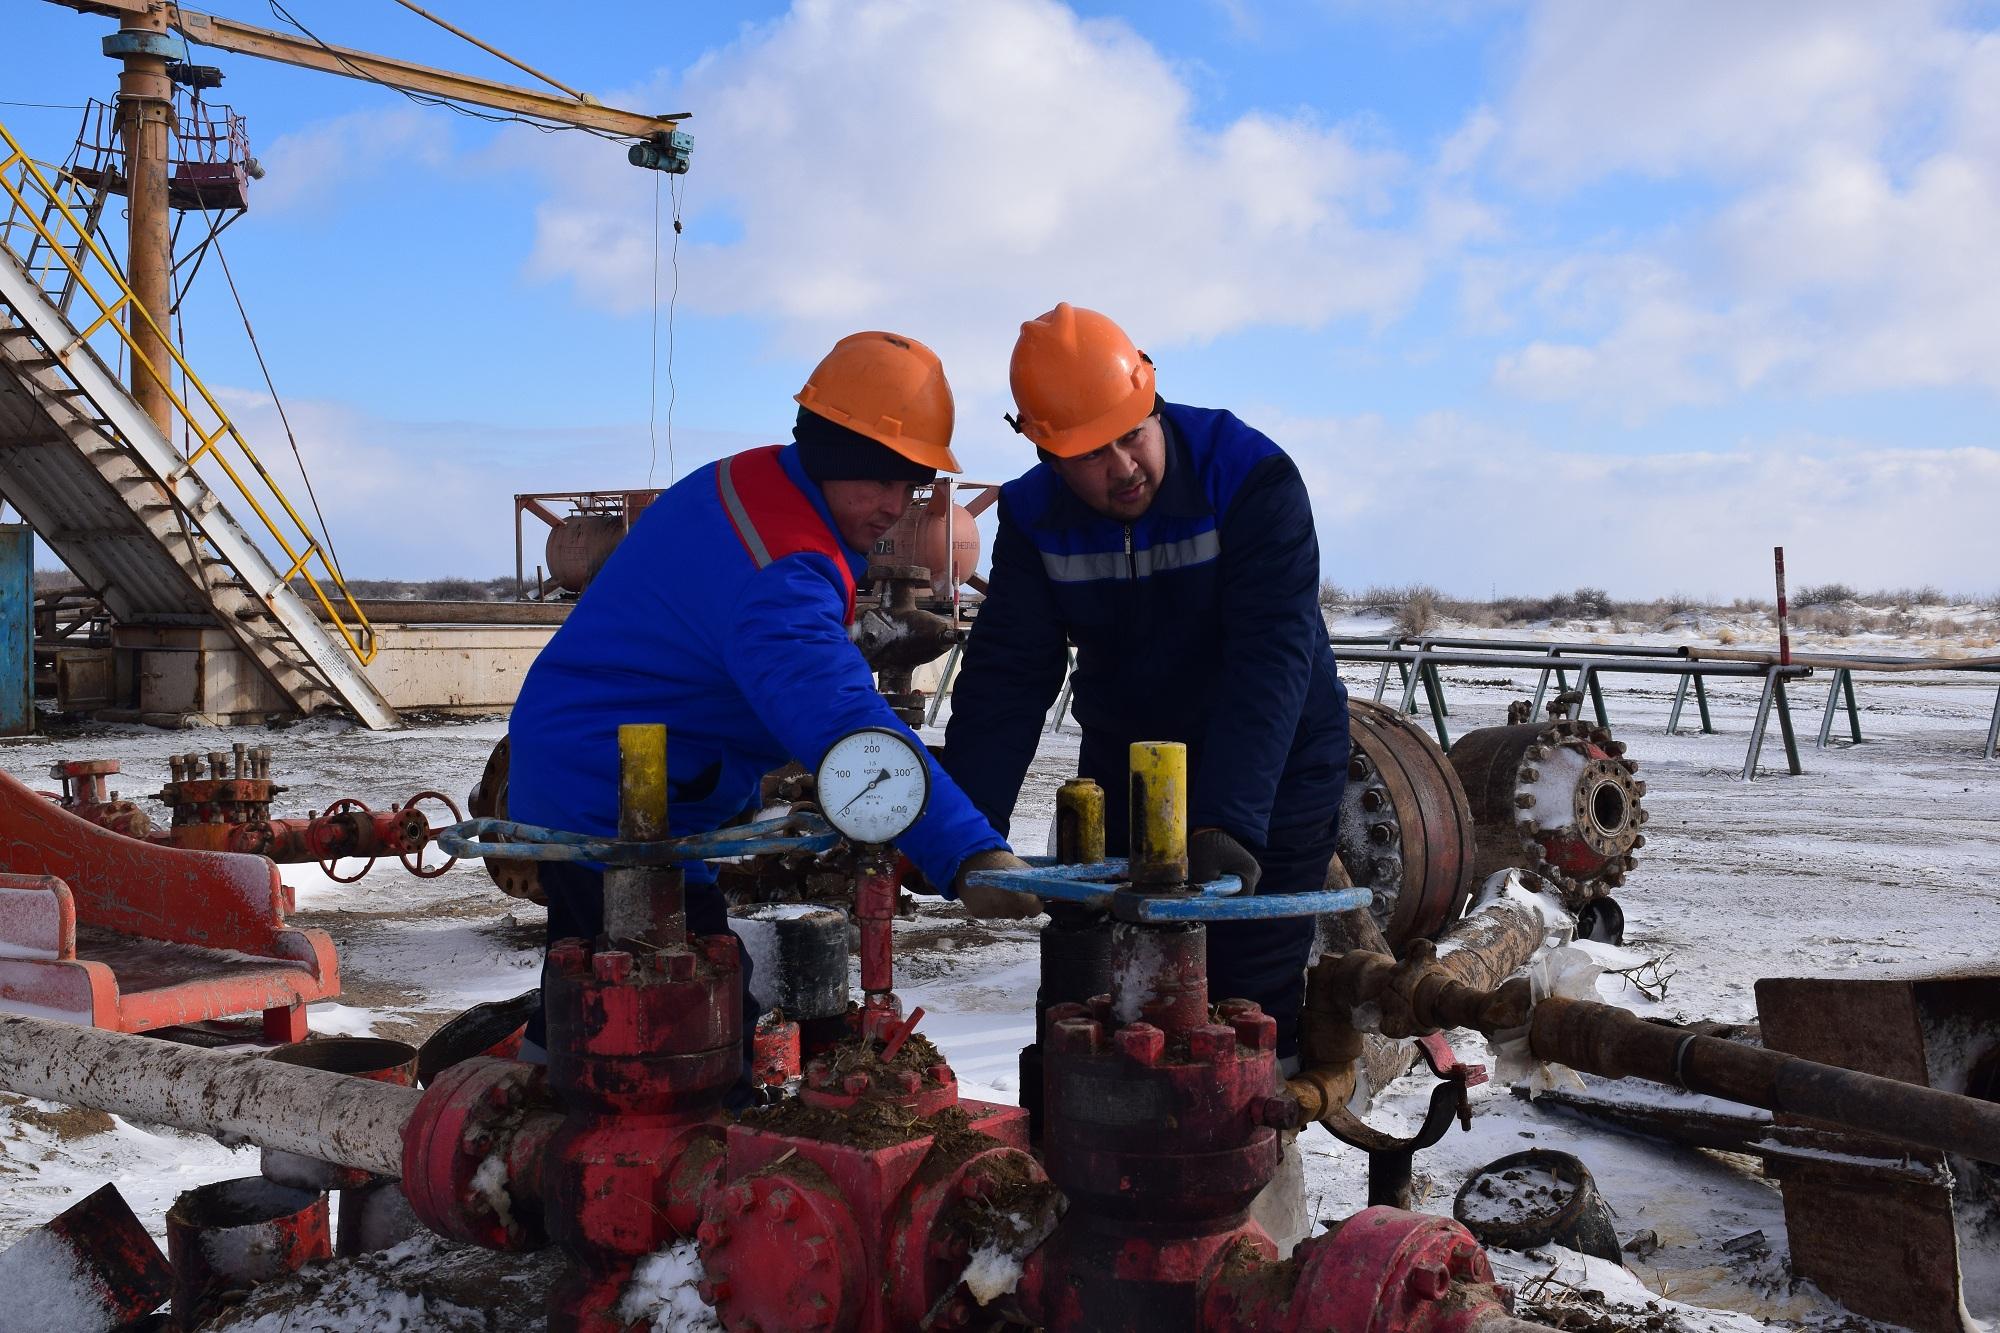 Tuyau Gaz Ouzbékistan Energie Asie centrale